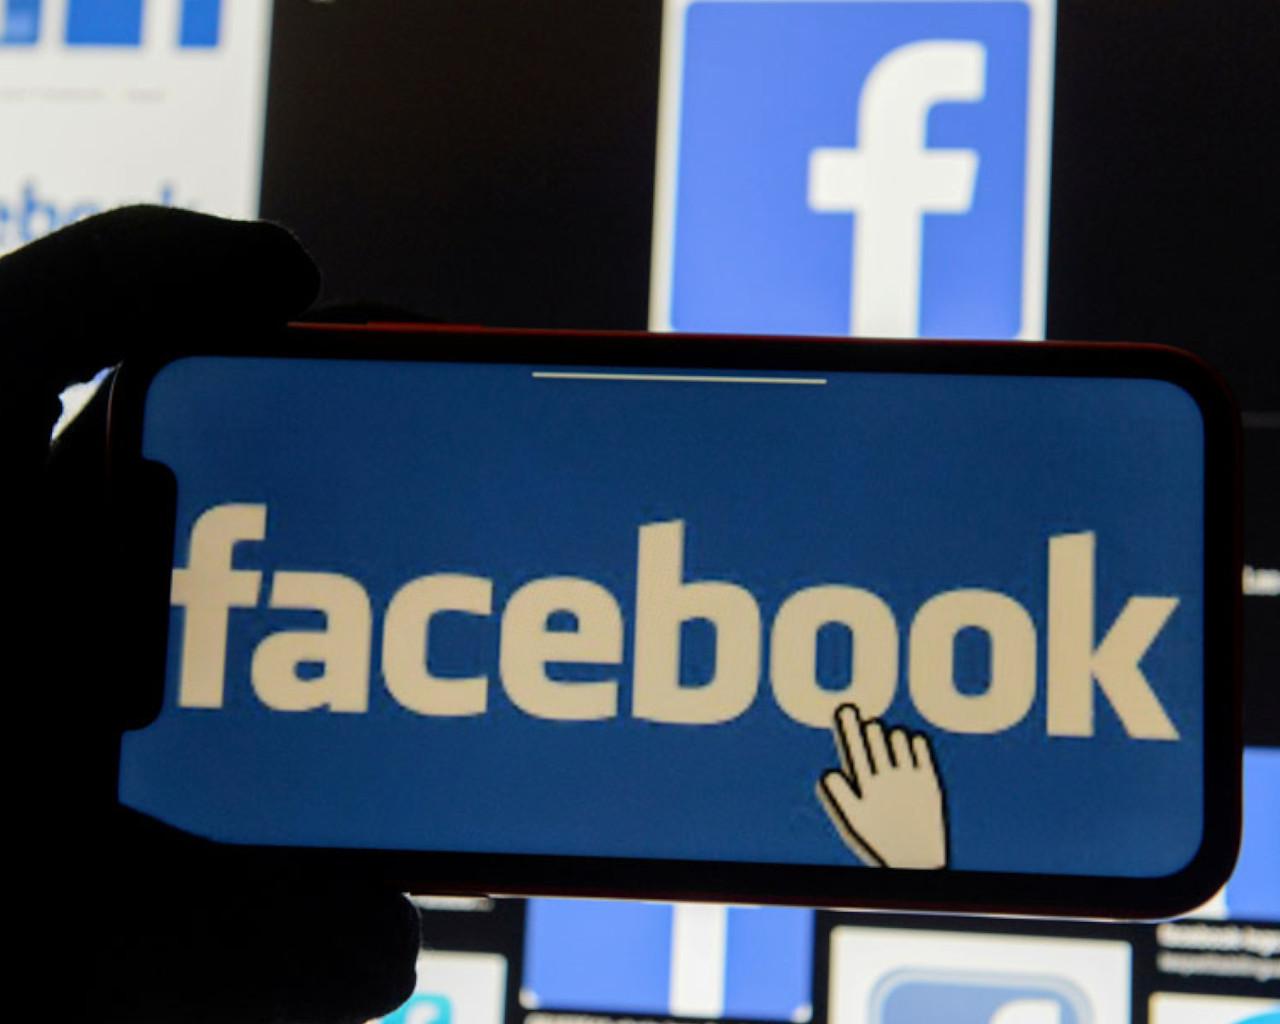 facebook,facebook download,facebook logo,facebook lite,facebook login,facebook συνδεση,facebook messenger,facebook marketplace,facebook dating